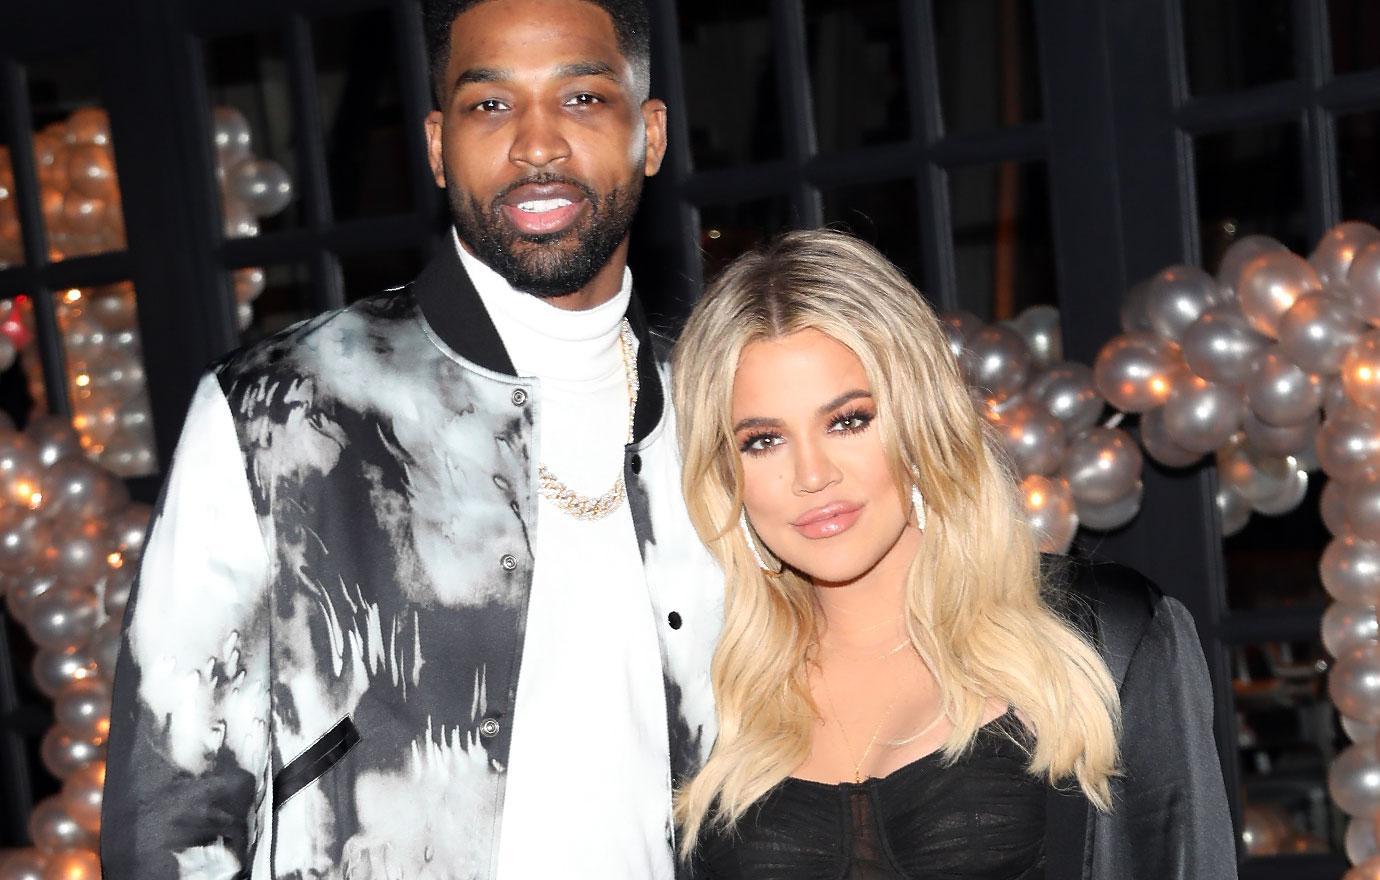 Khloe Kardashian And Tristan Thompson Celebrate New Year In Cleveland